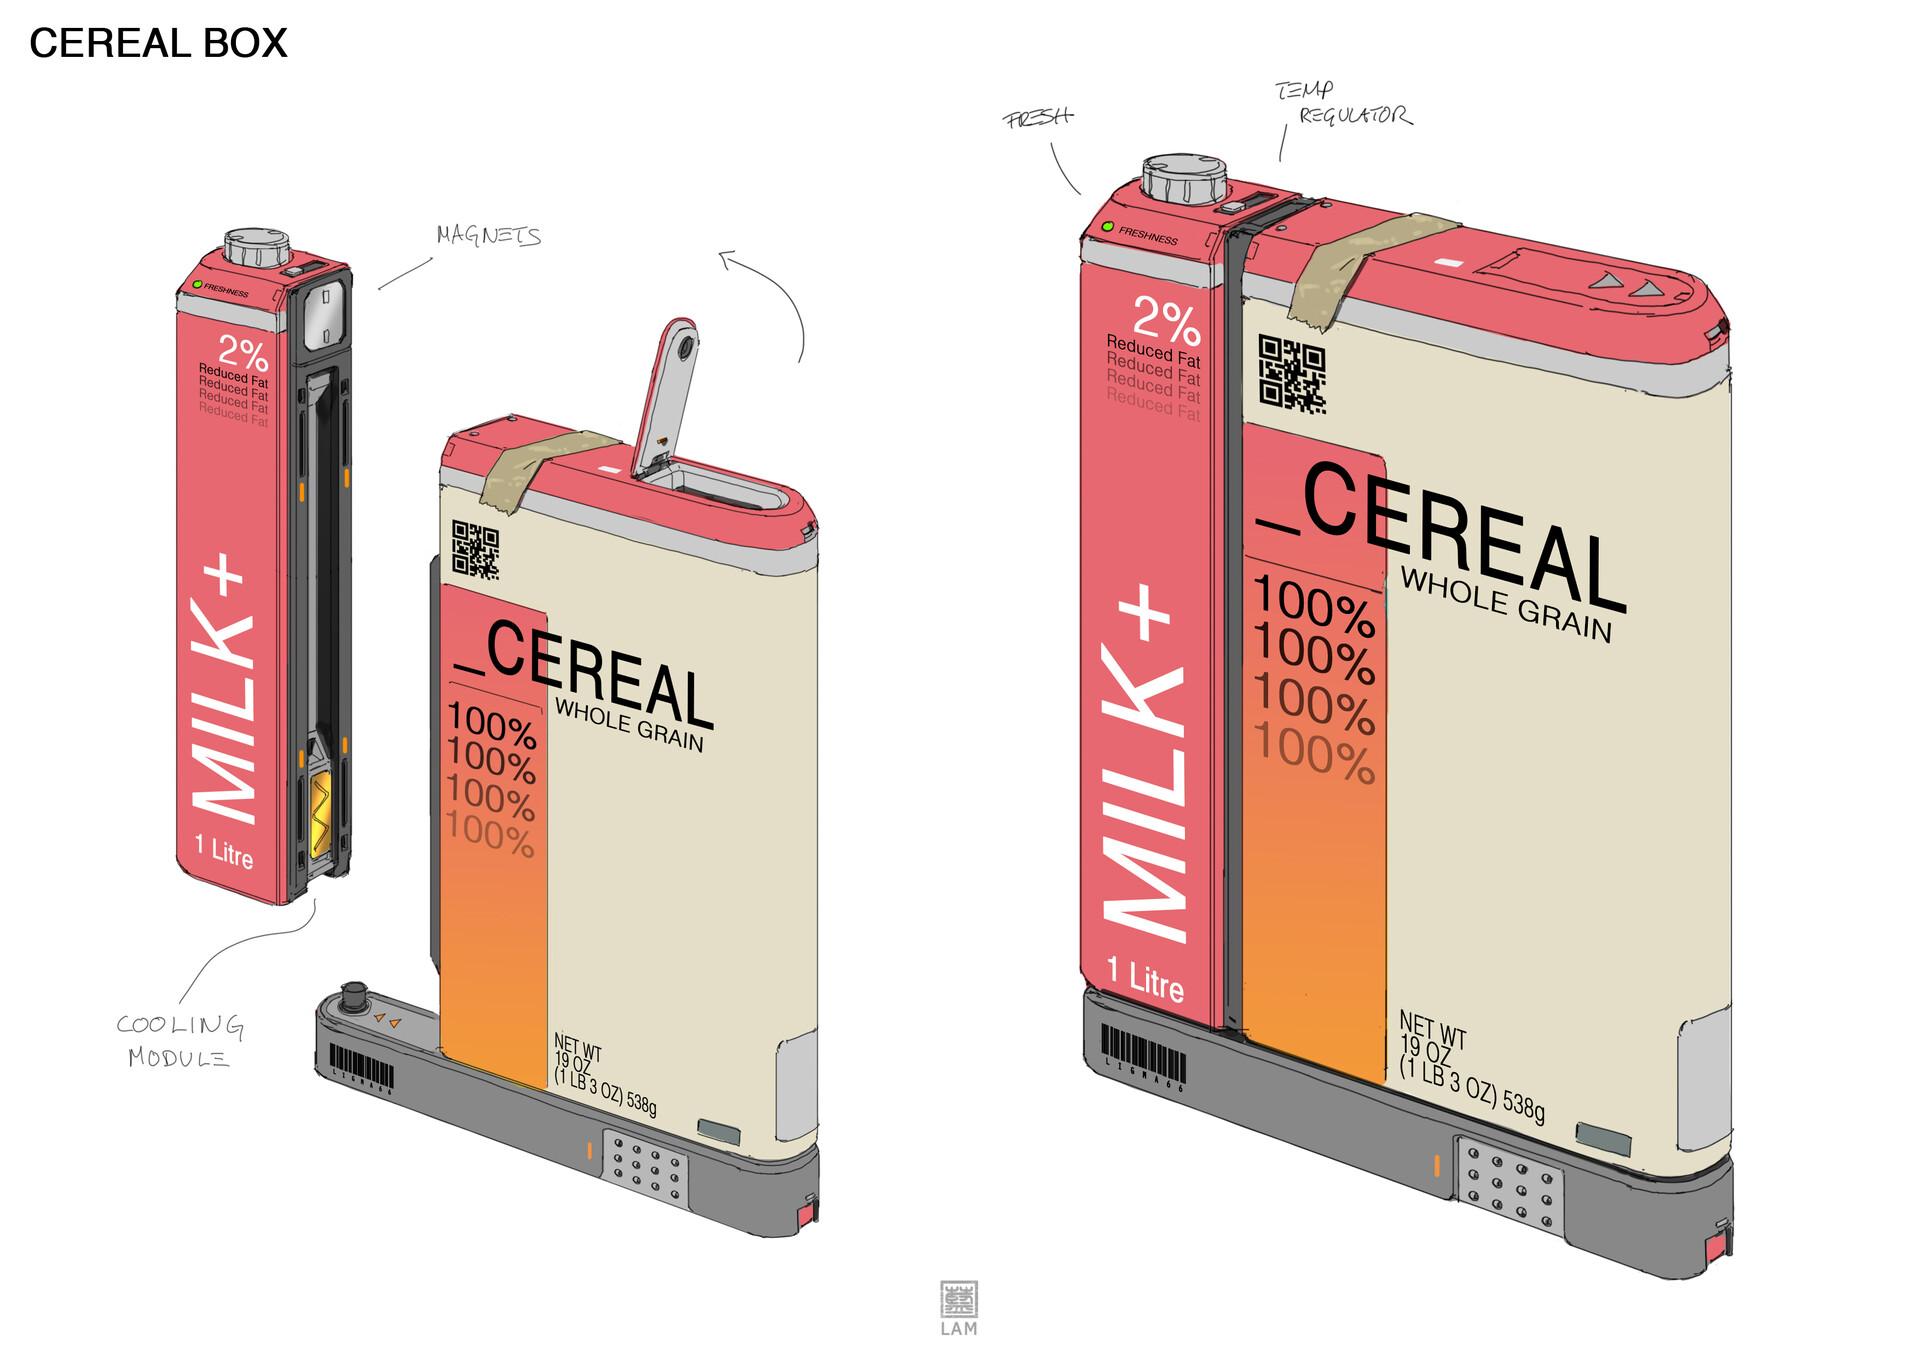 Sheng lam cereal box 03dec18